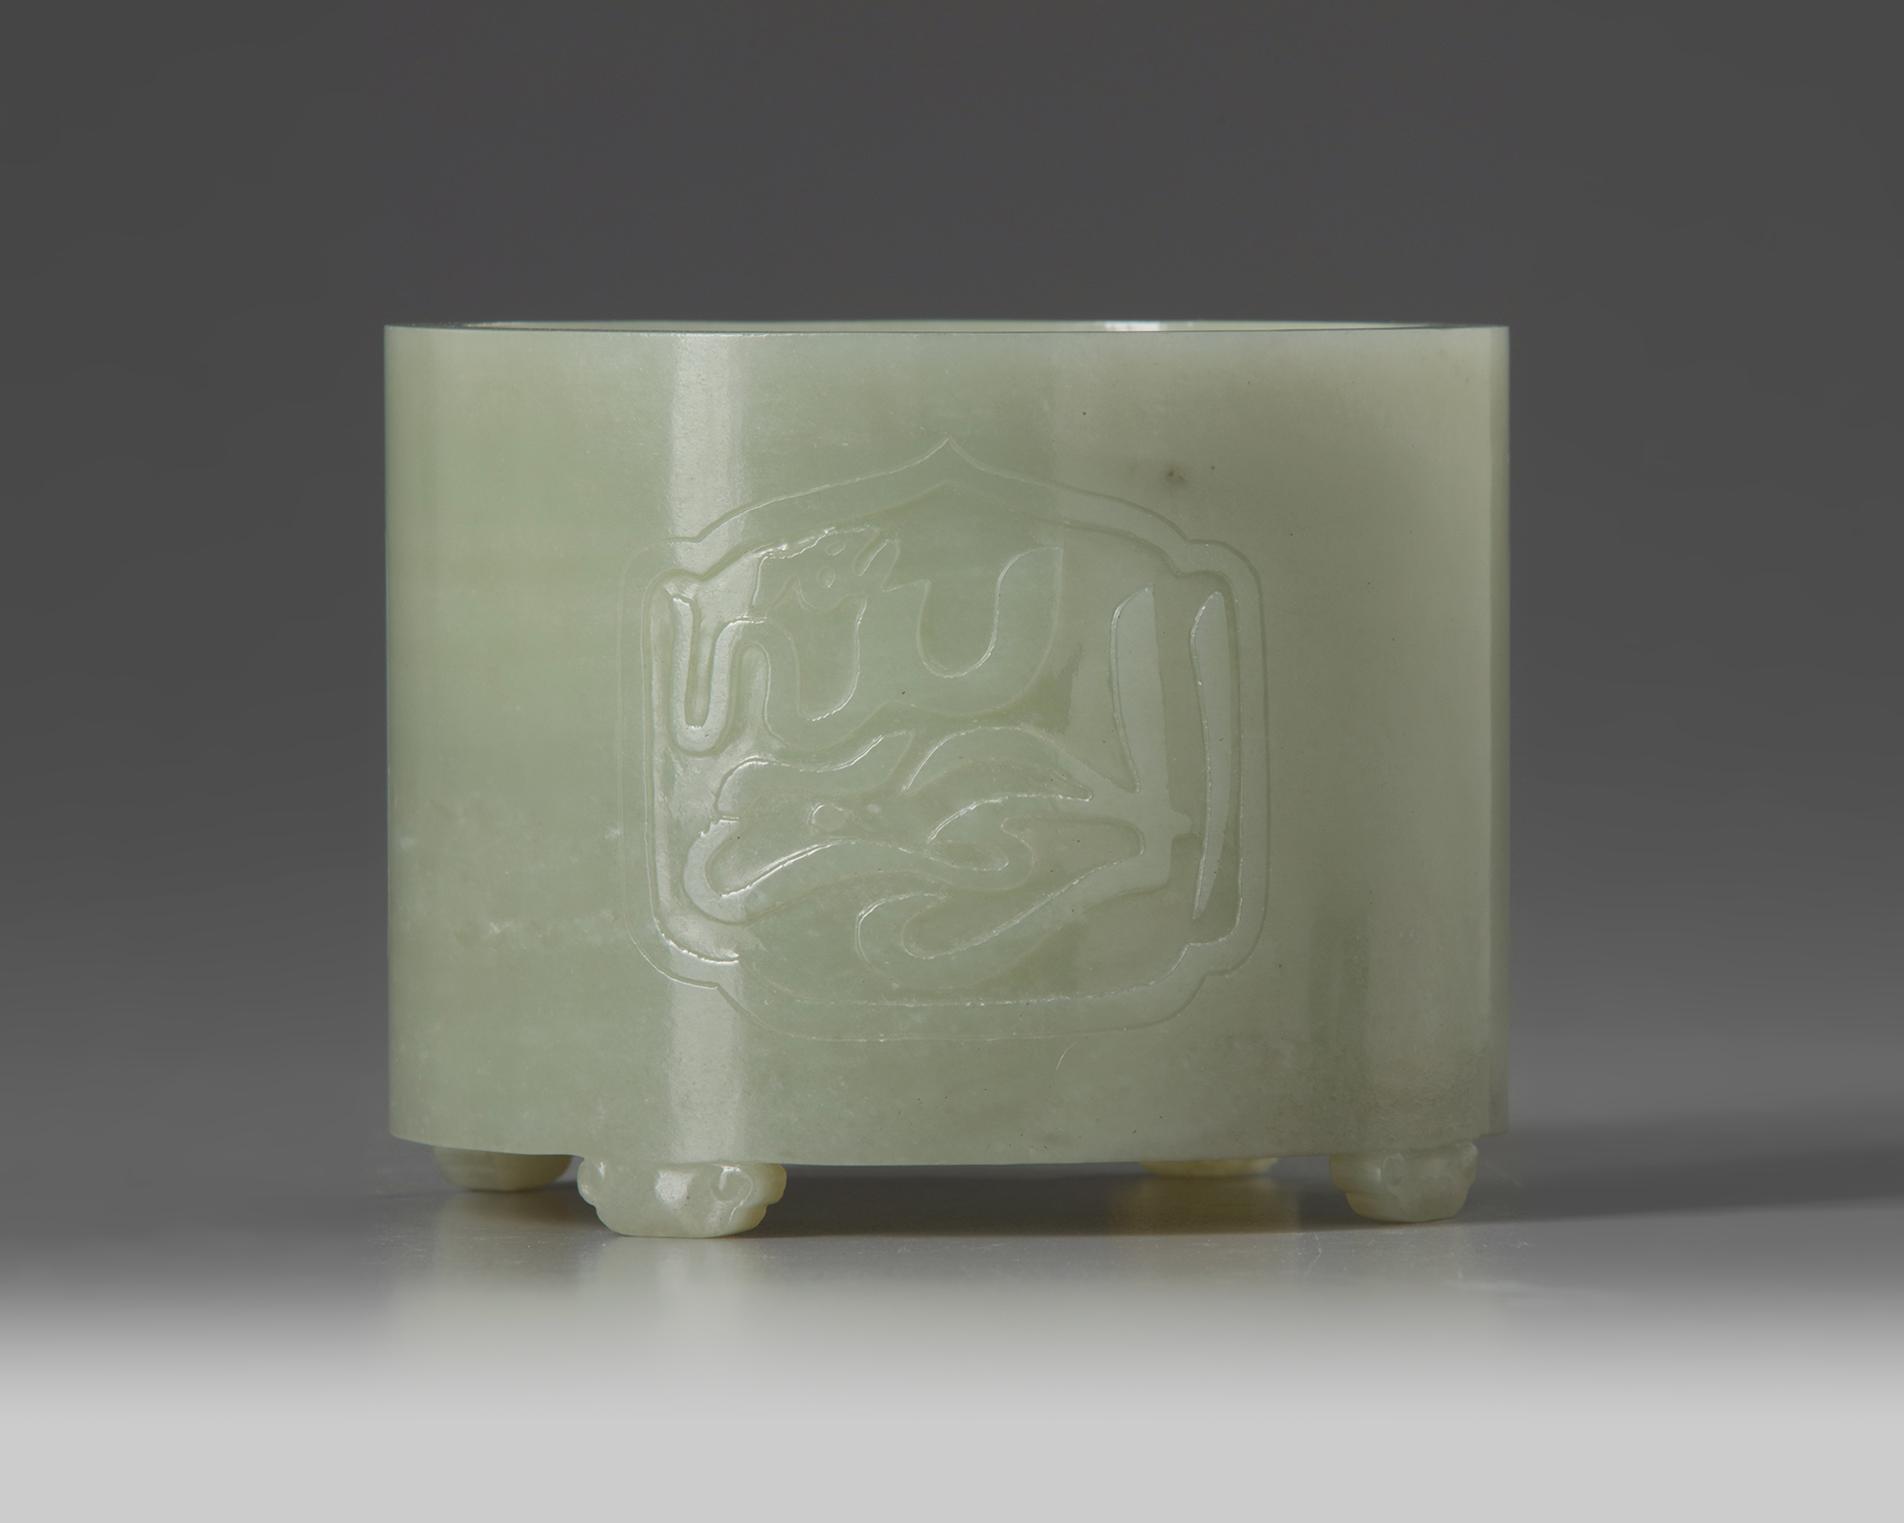 Lot 57 - A Chinese pale celadon jade 'Islamic market' censer